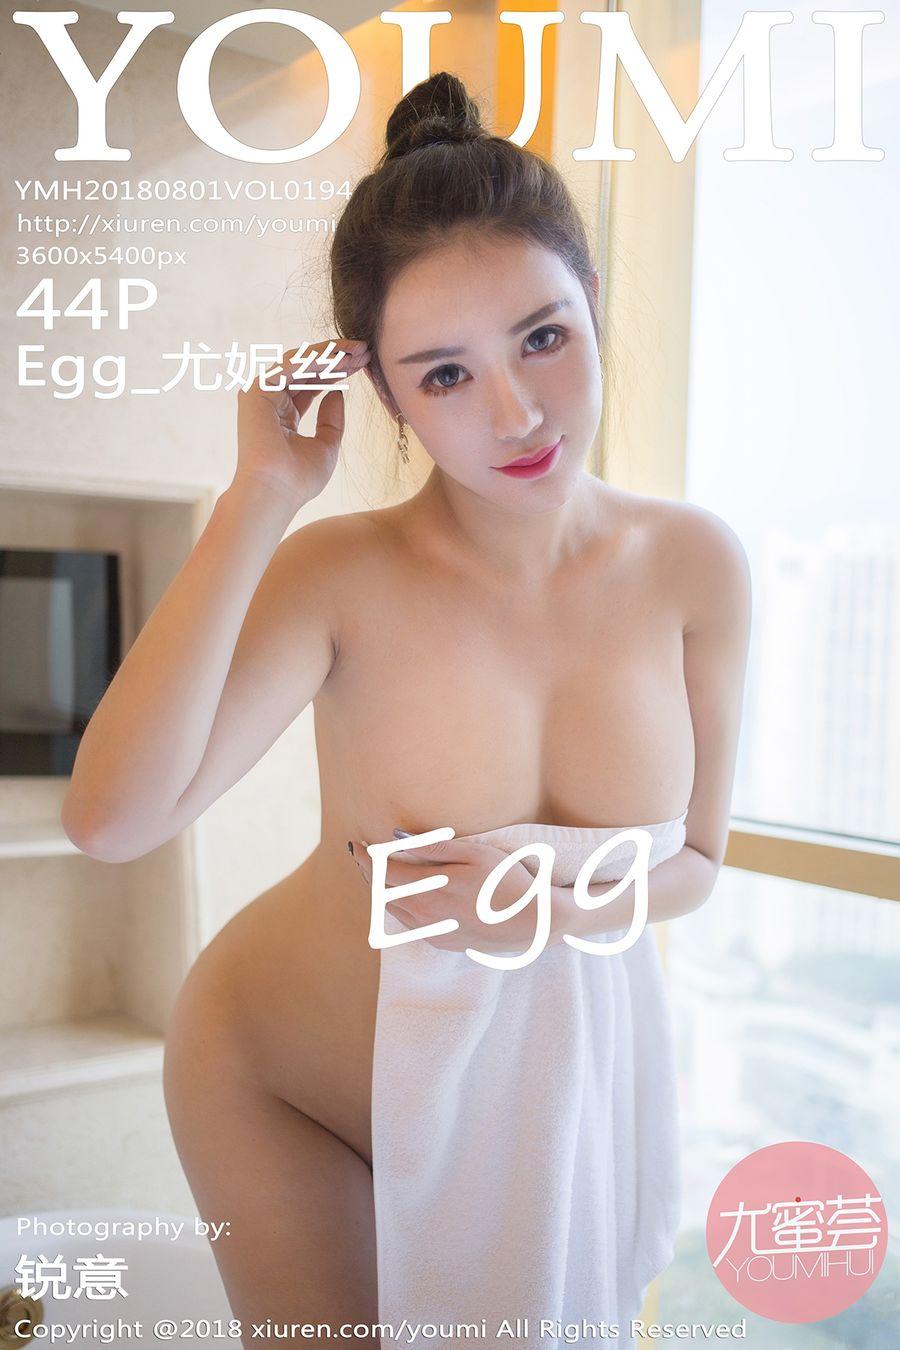 [YOUMI尤蜜荟] VOL.194 Egg_尤妮丝 [44+1P/145M]